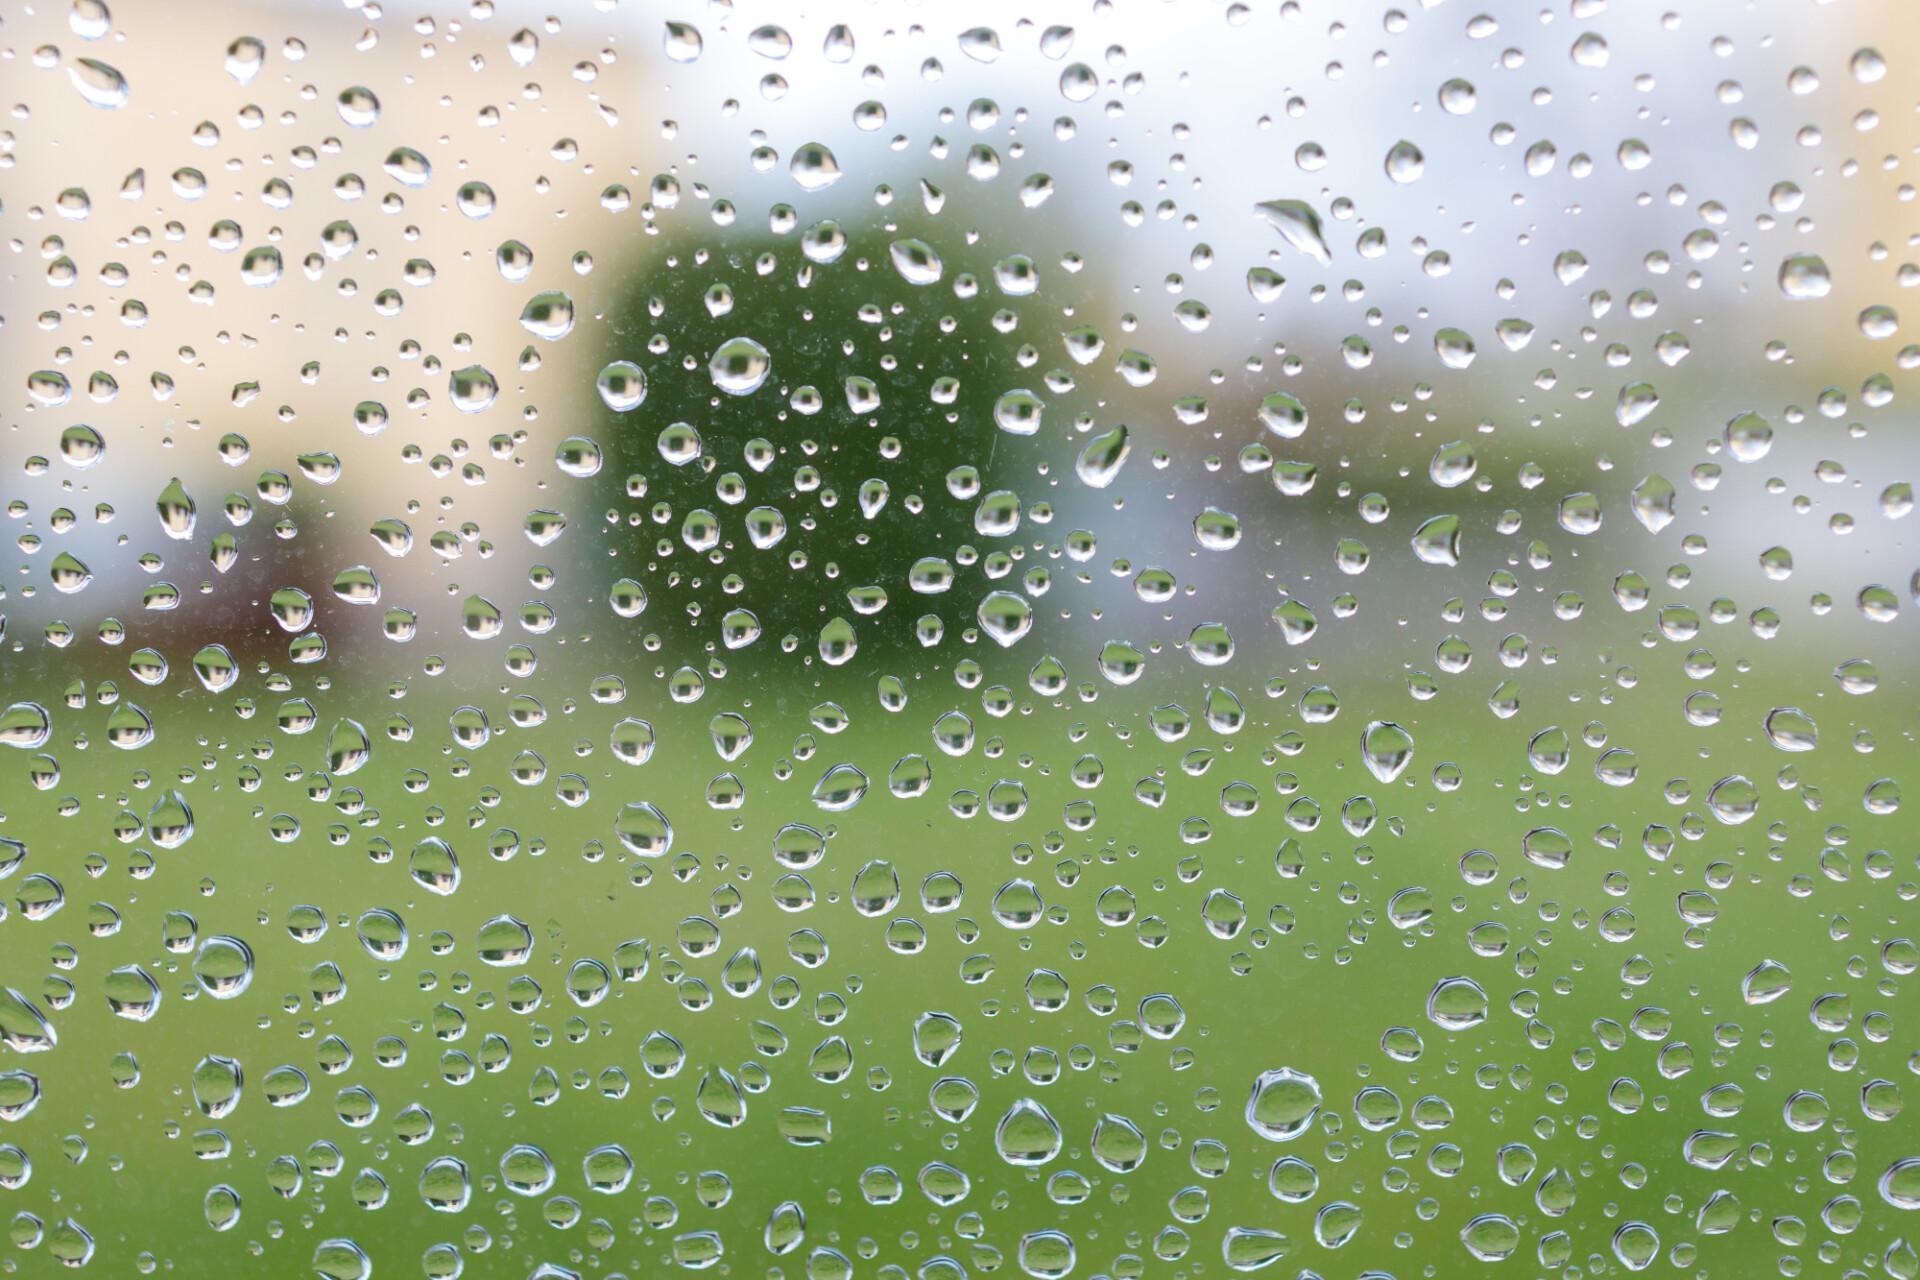 Raindrops on window pane